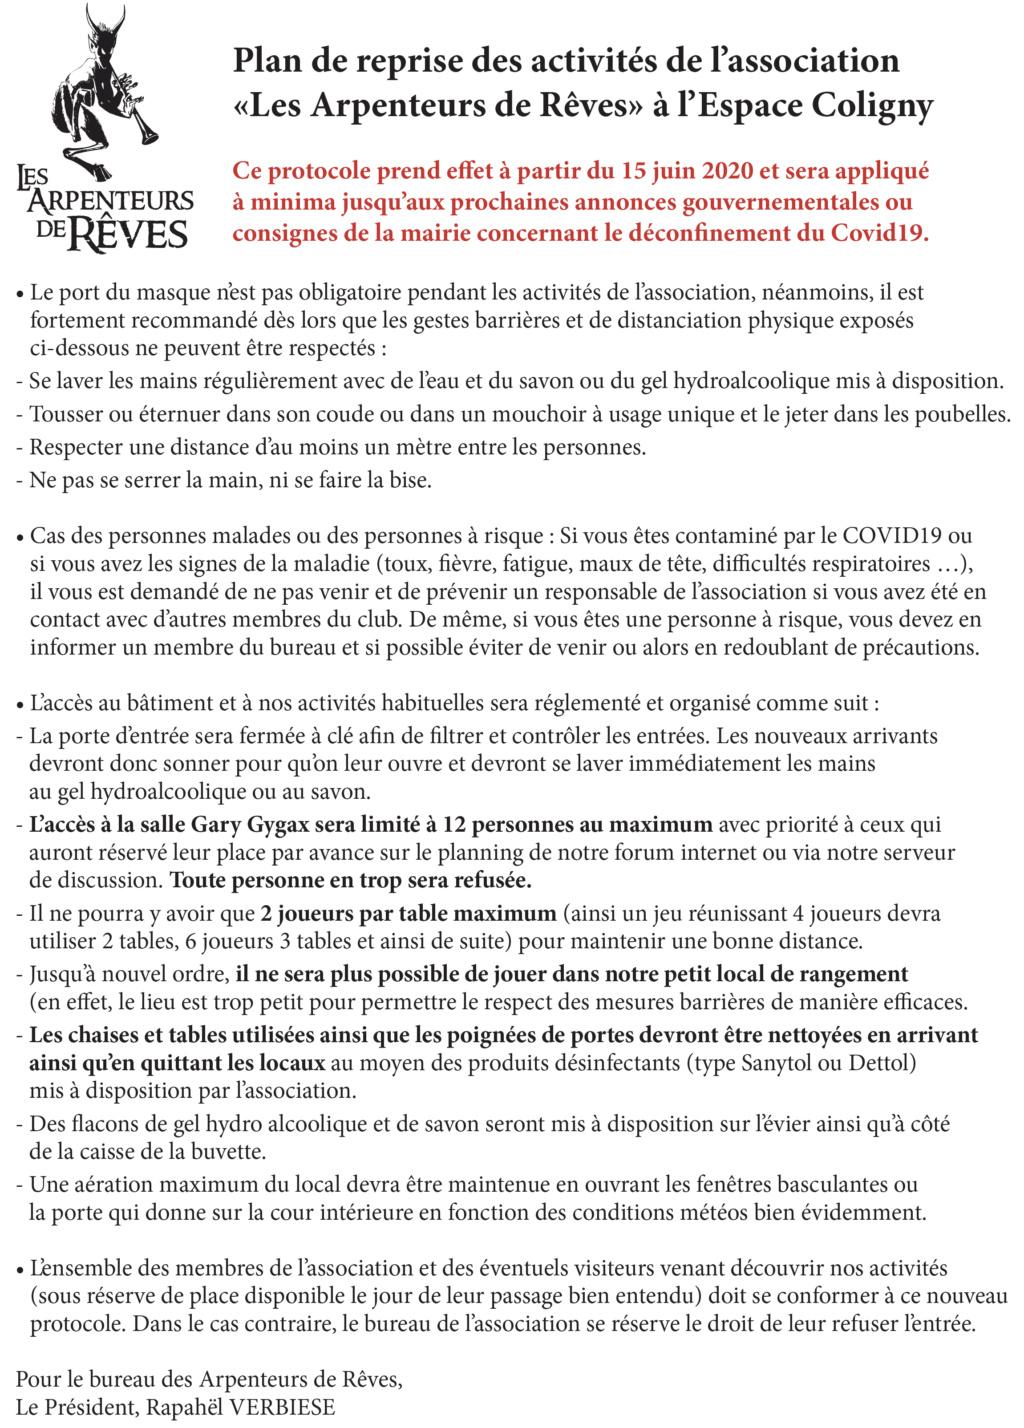 CRISE DU CORONAVIRUS : INFORMATIONS IMPORTANTES Protoc10